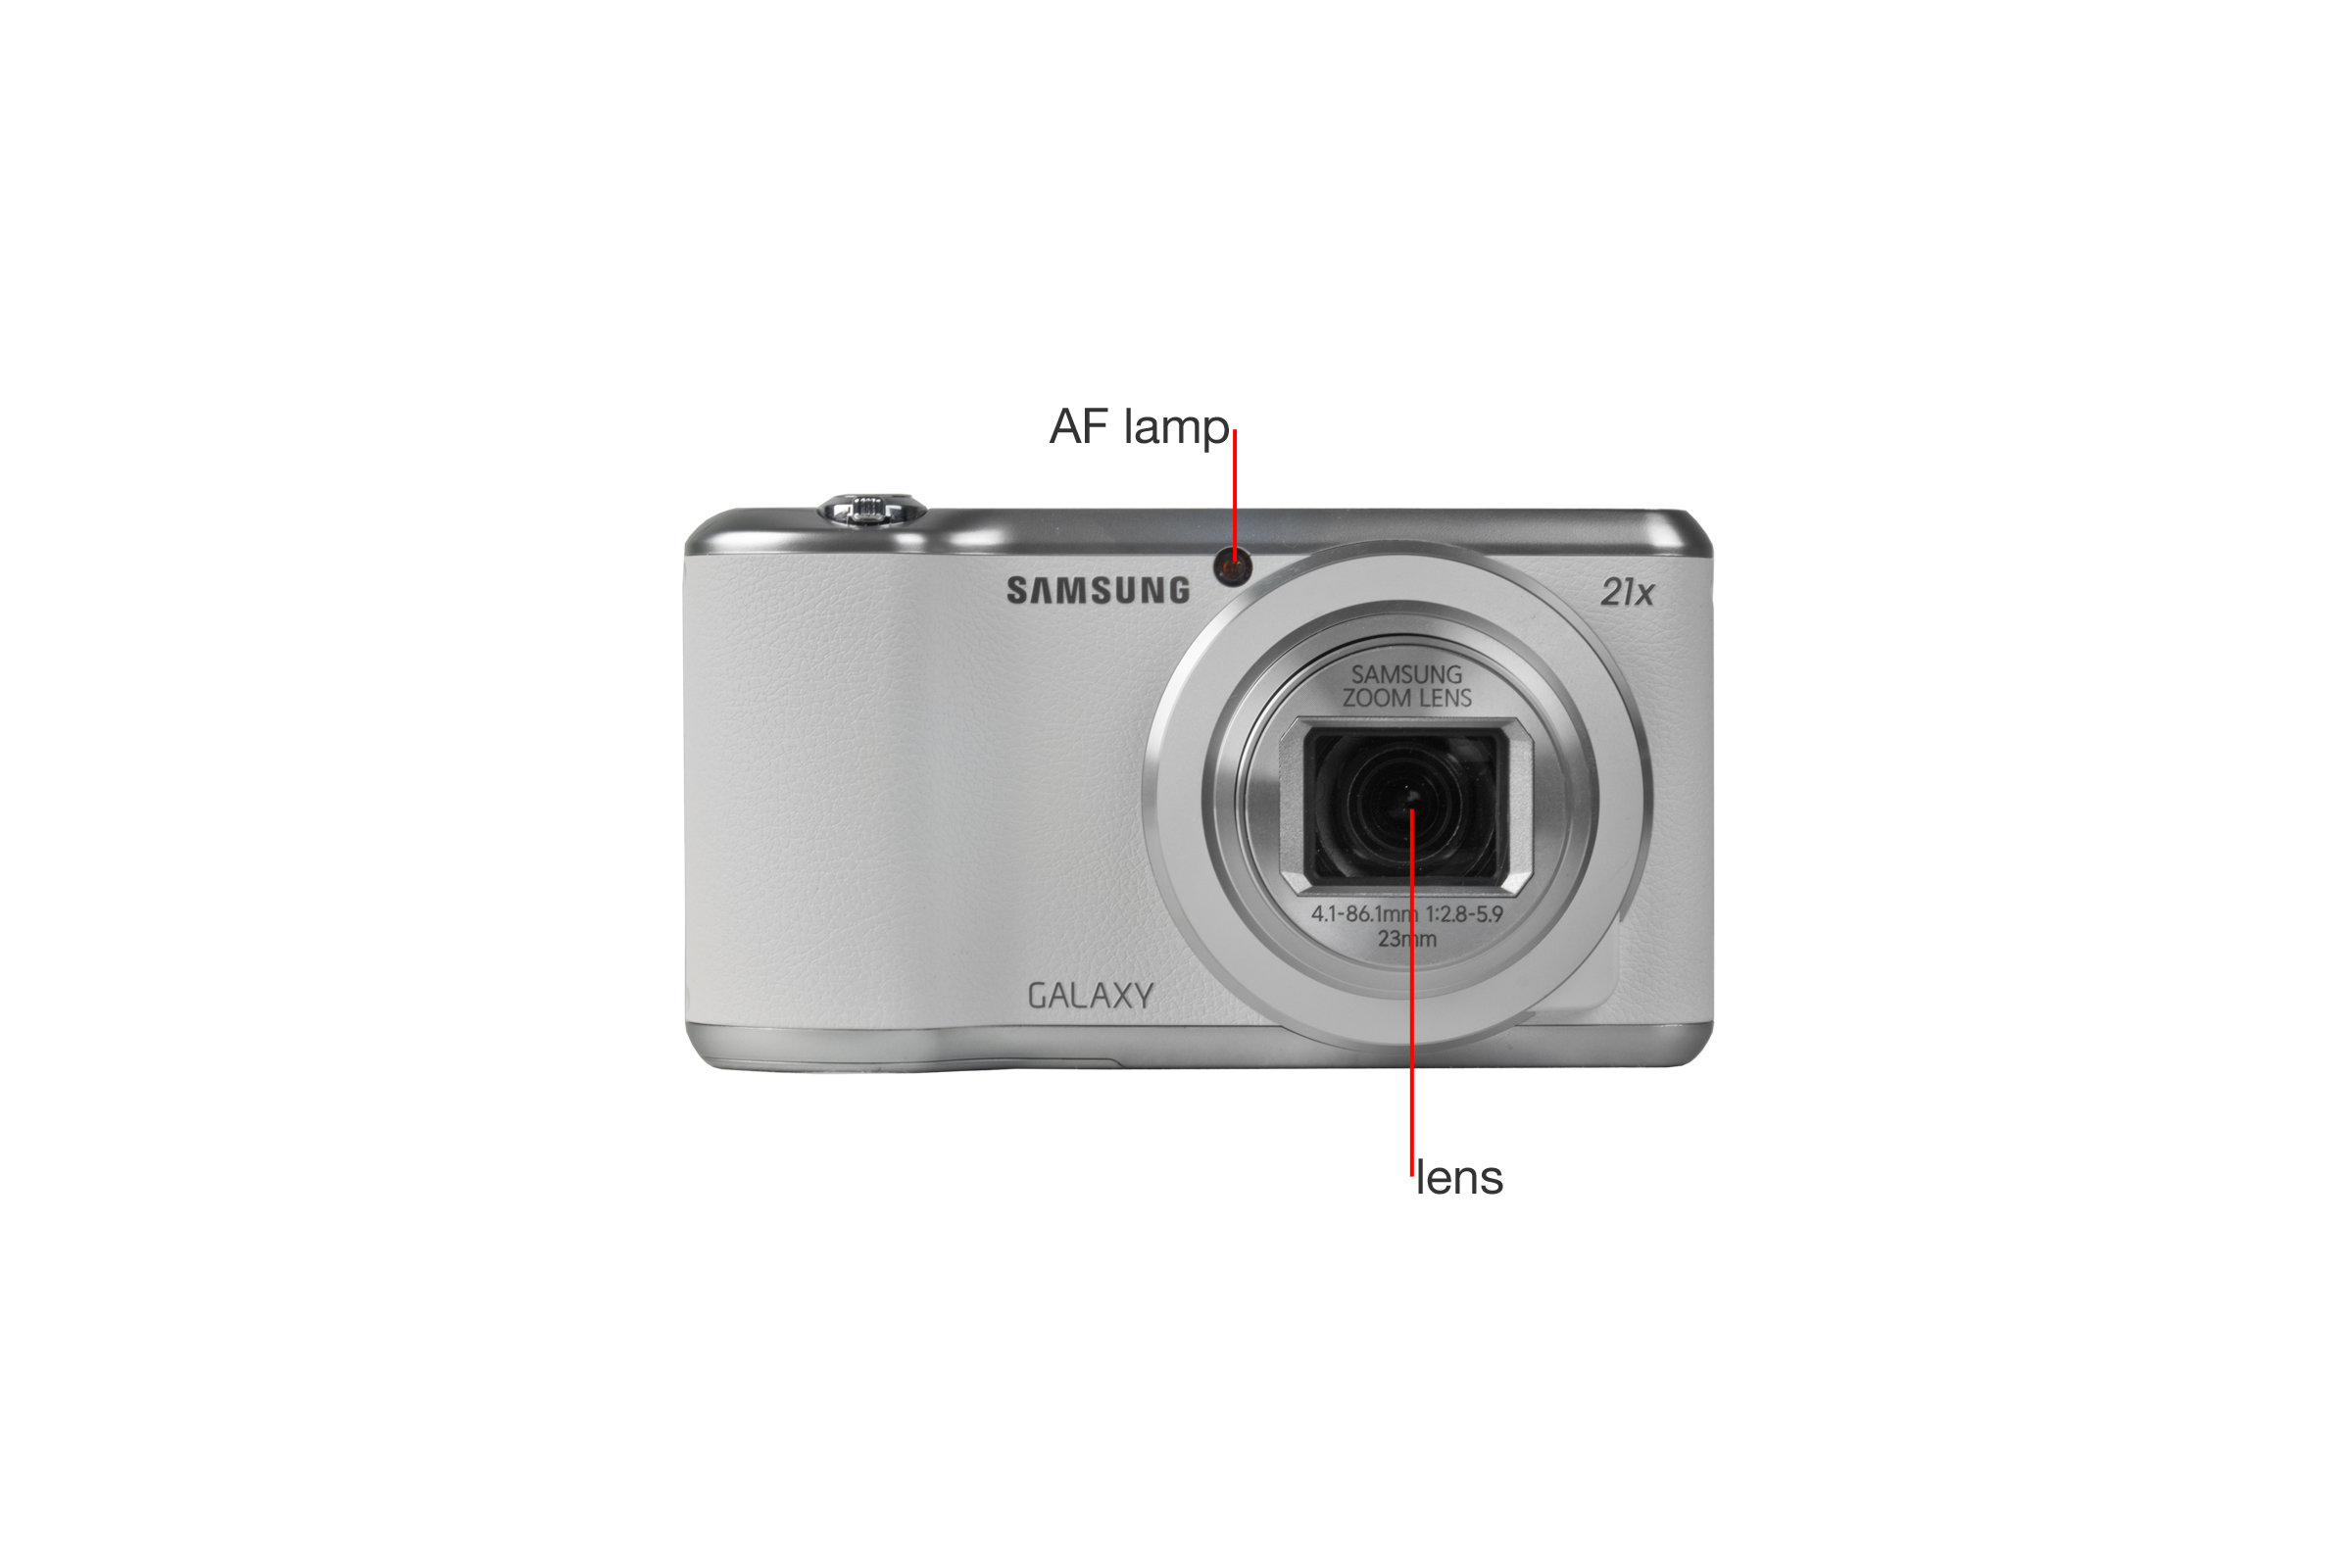 A closer look at the Samsung Galaxy Camera 2's front.